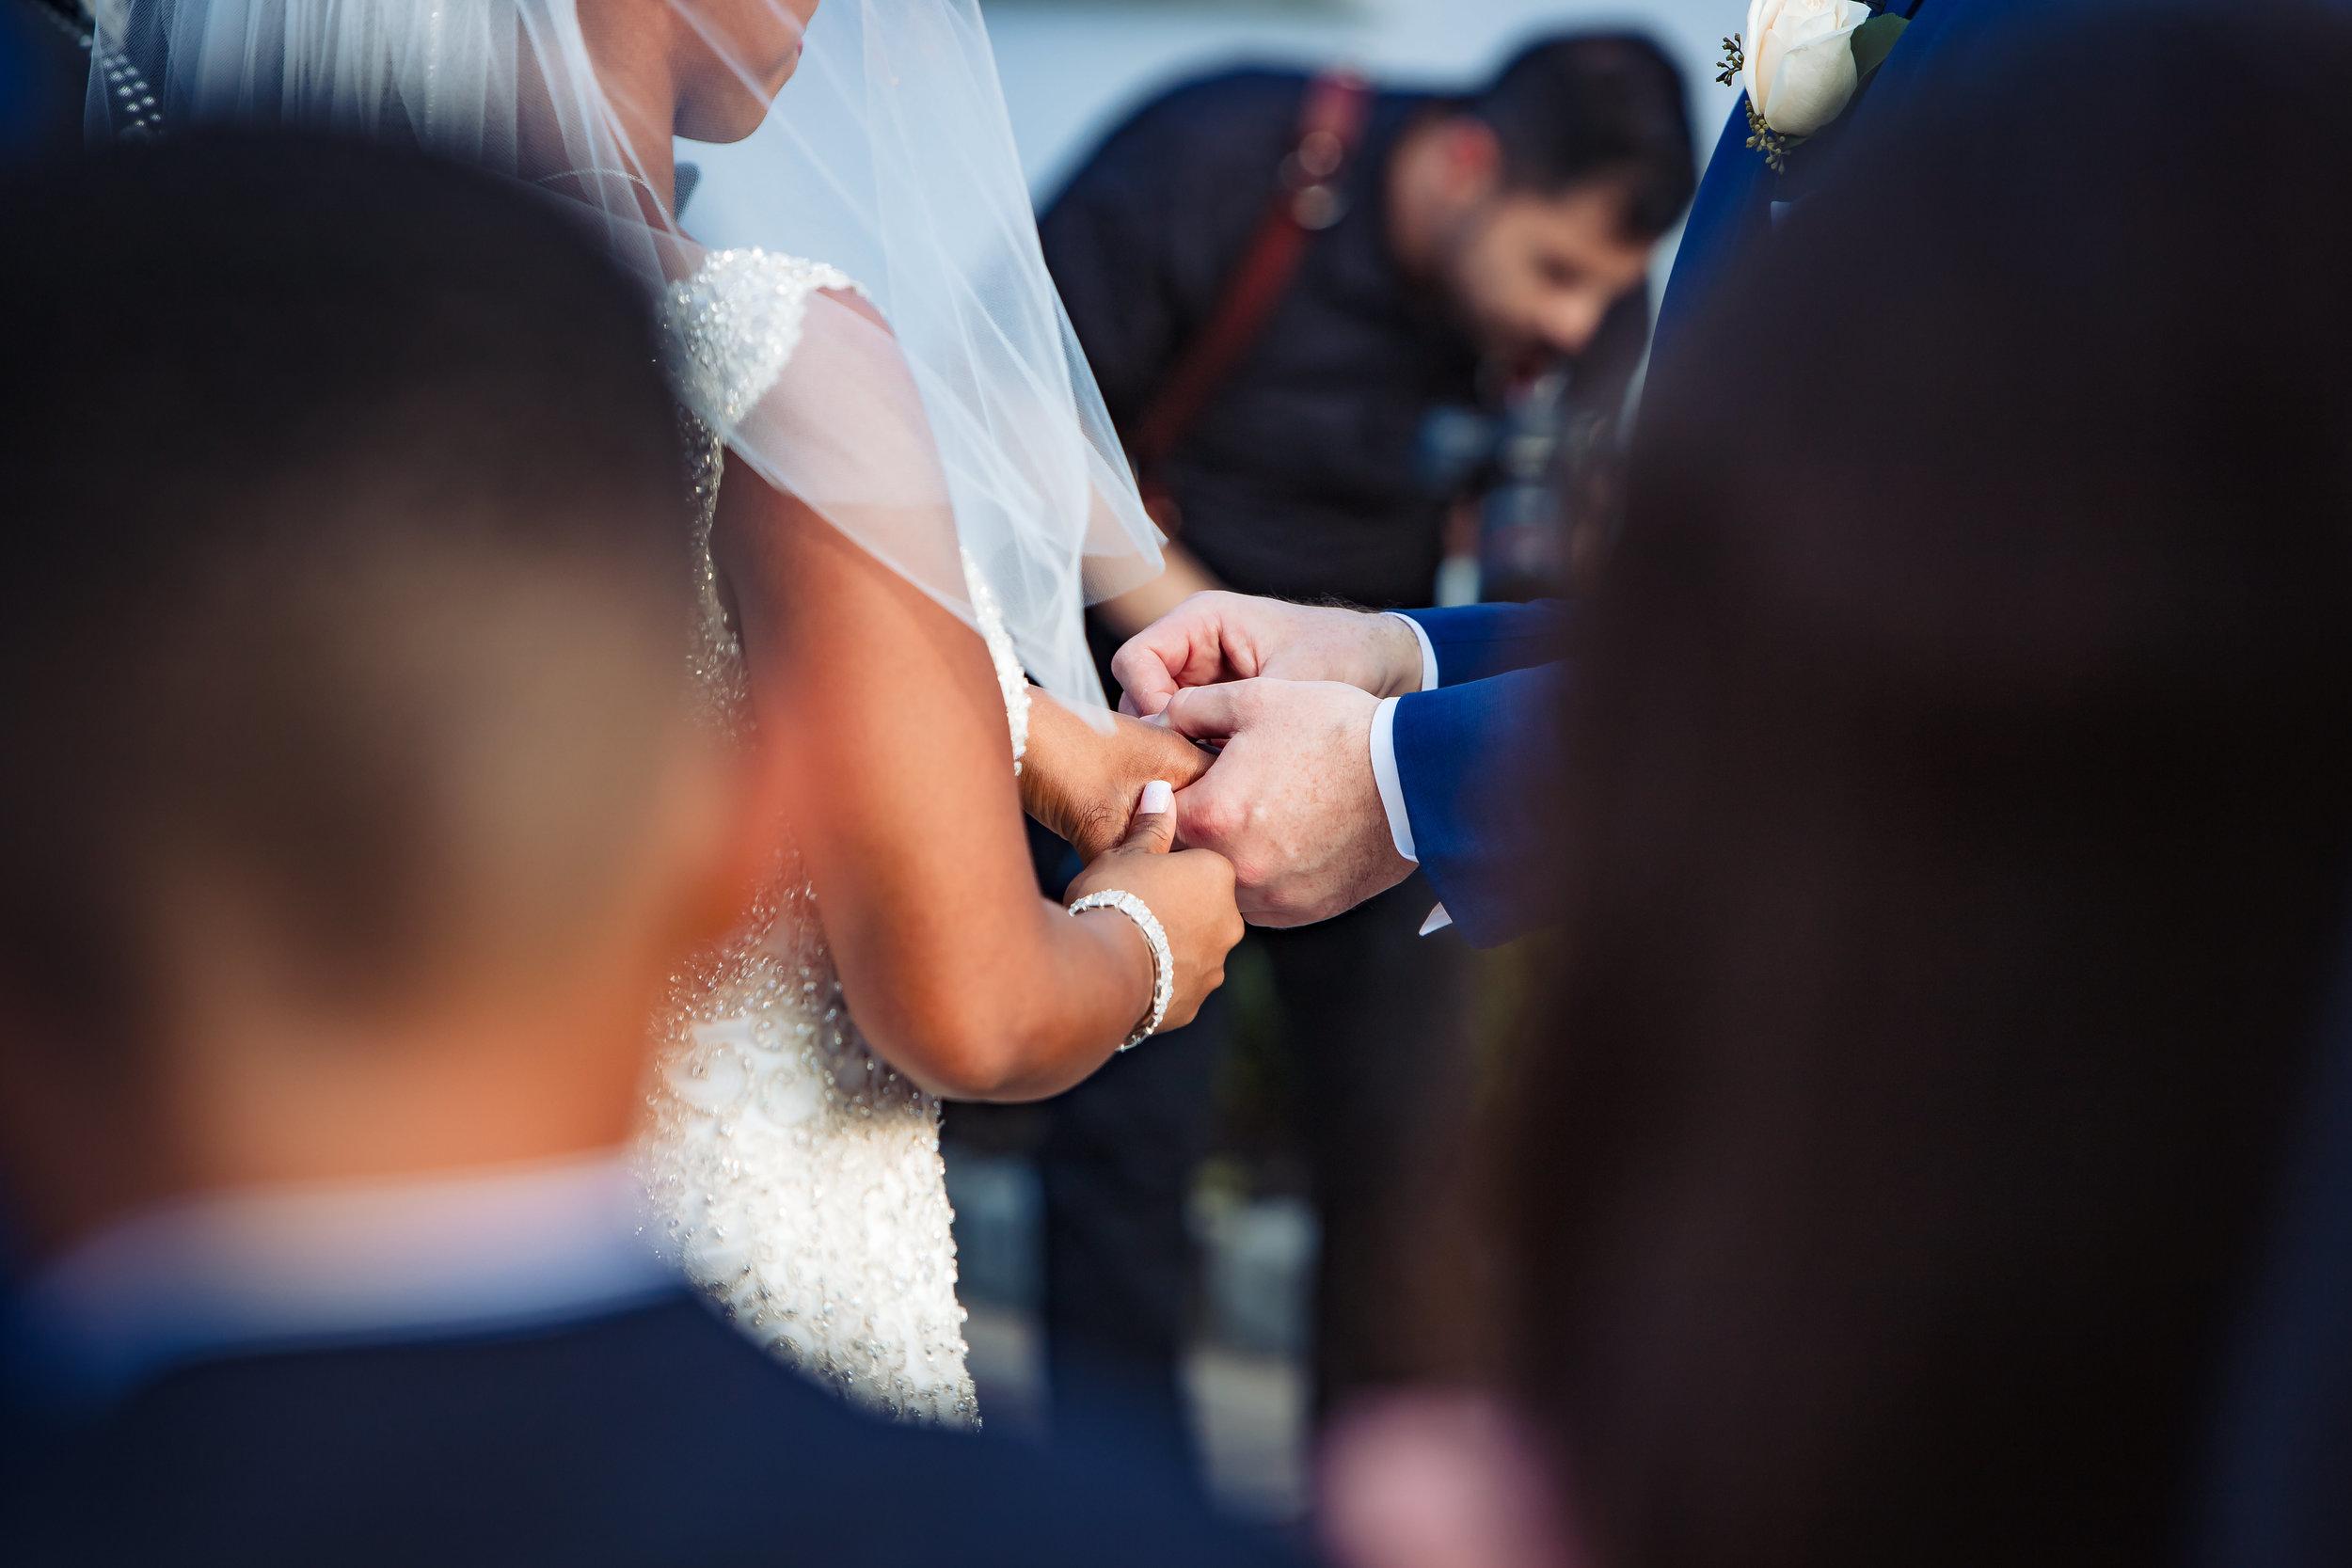 groom putting wedding ring on his bride